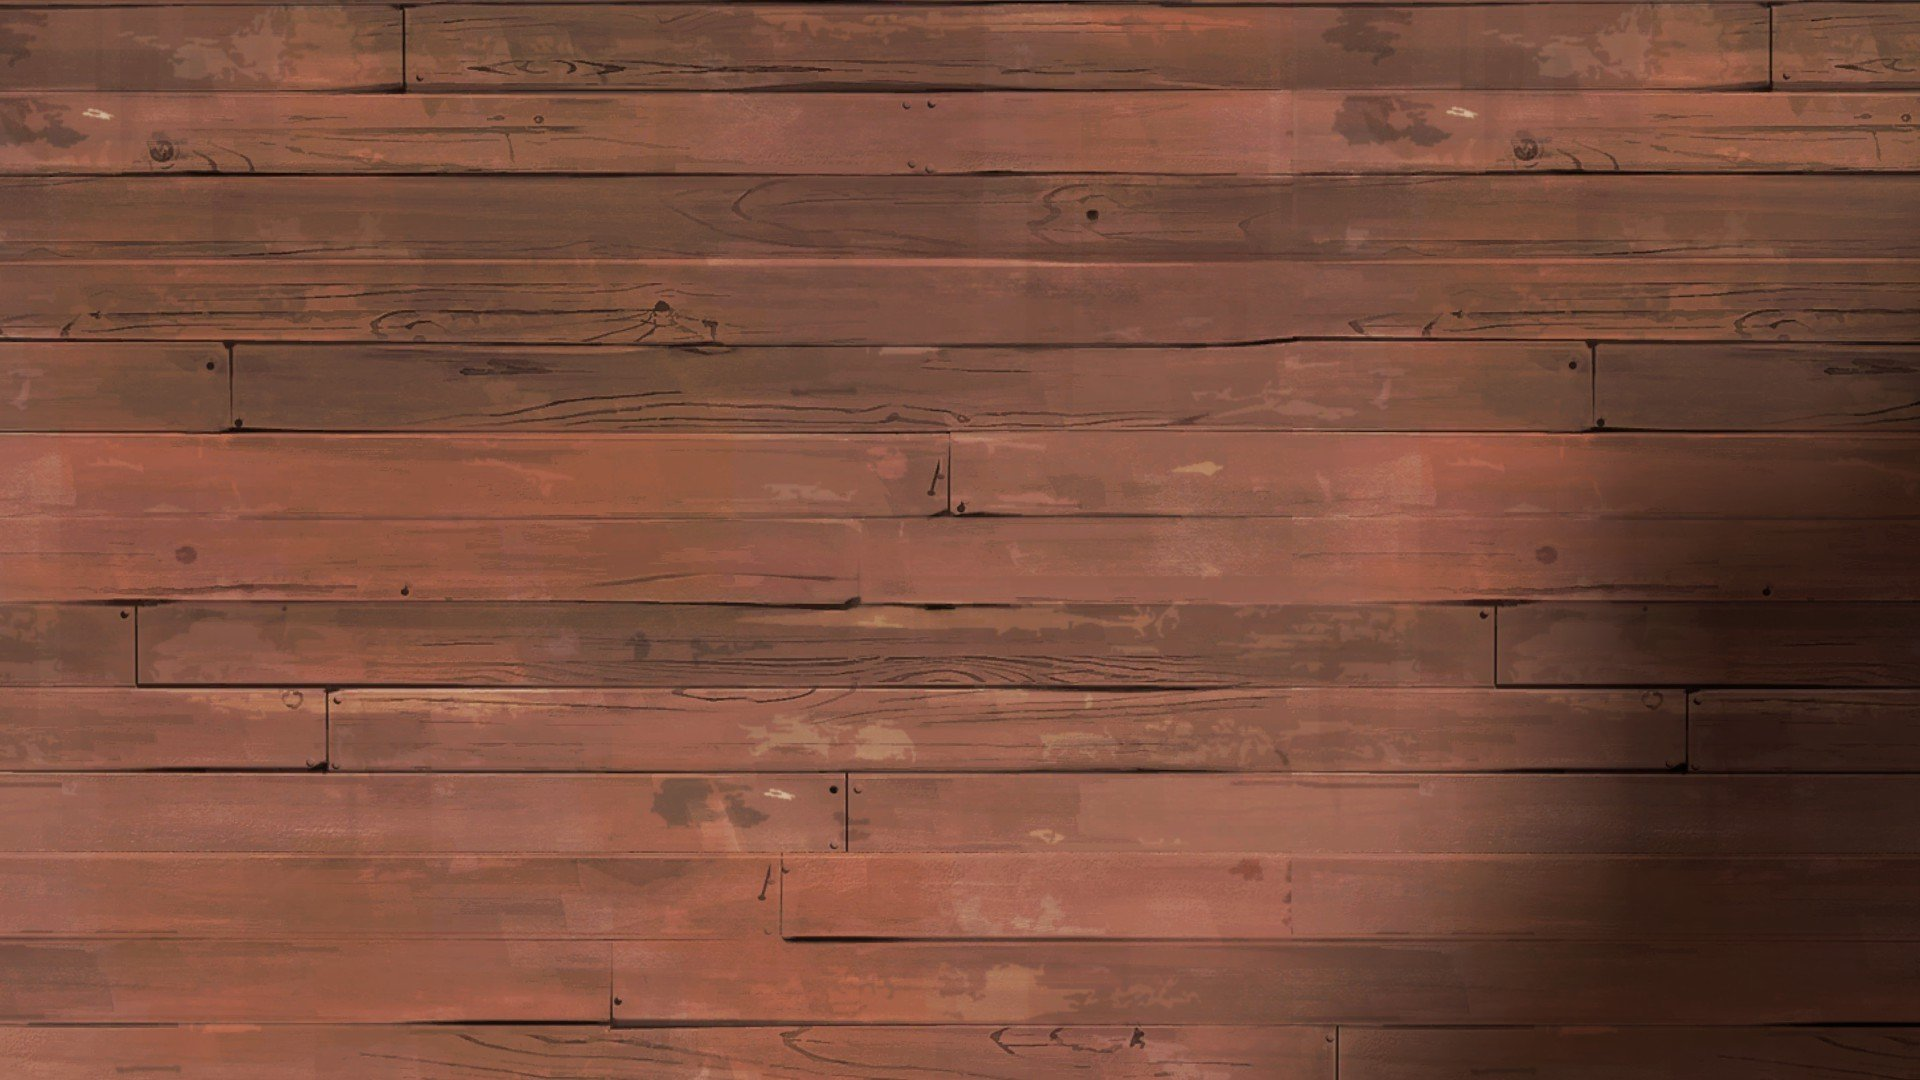 Wood Wall Wallpaper 1920x1080 Wood Wall Textures Team Fortress 2 1920x1080